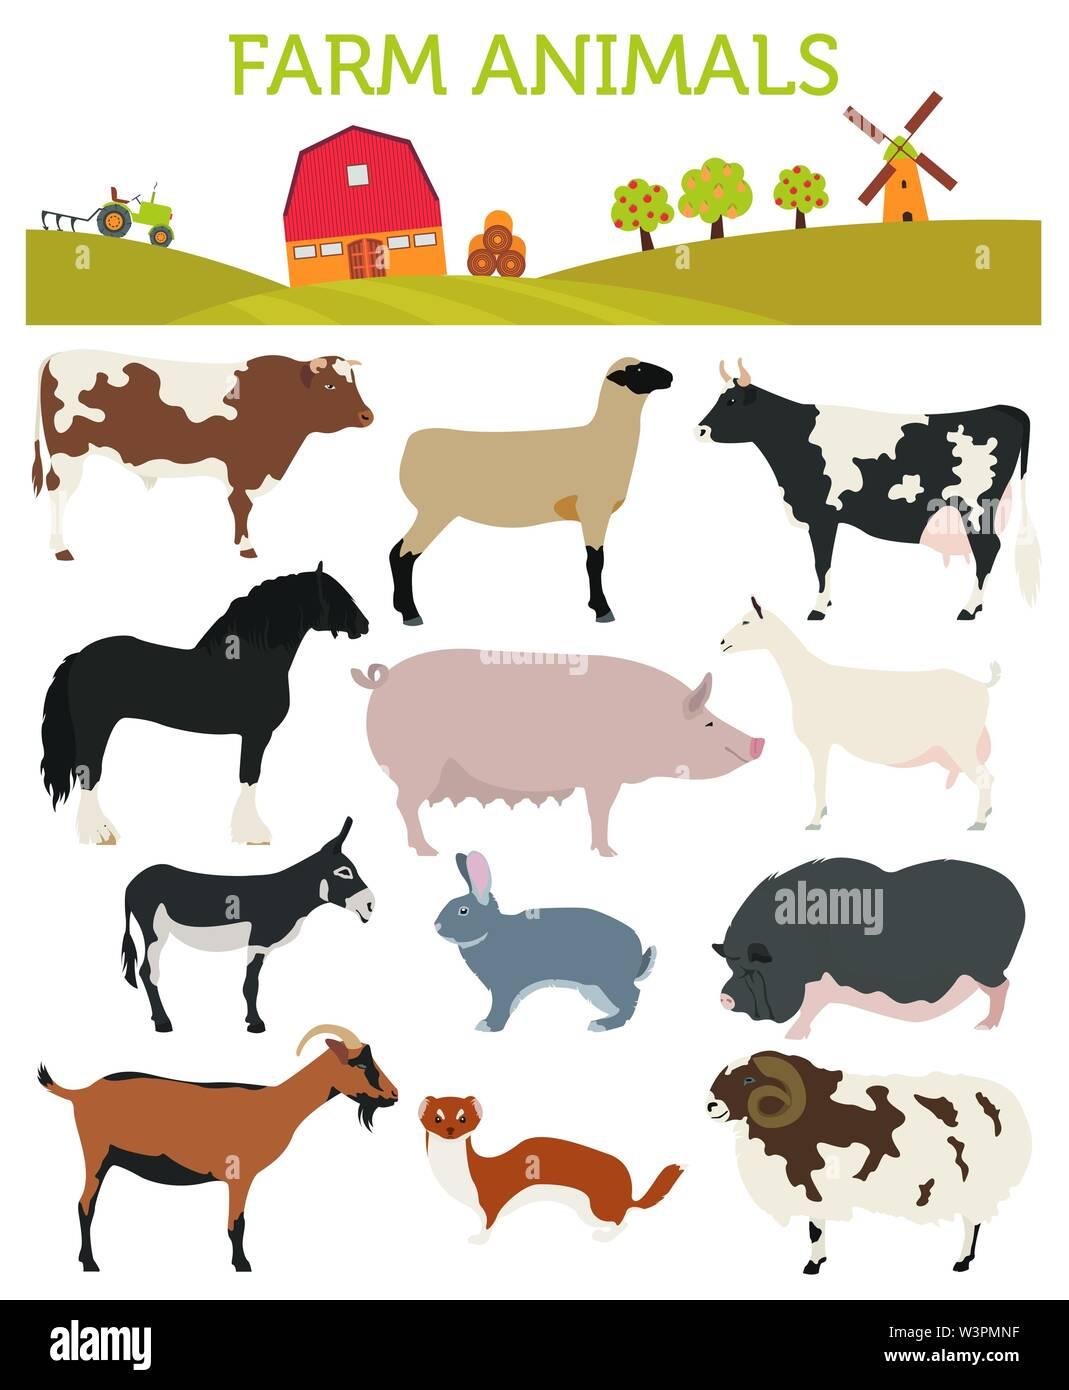 Animal Farming Livestock Cattle Pig Goat Ship Horse Donkey Rabbit Fur Icon Set Isolated On White Flat Design Vector Illustration Stock Vector Image Art Alamy